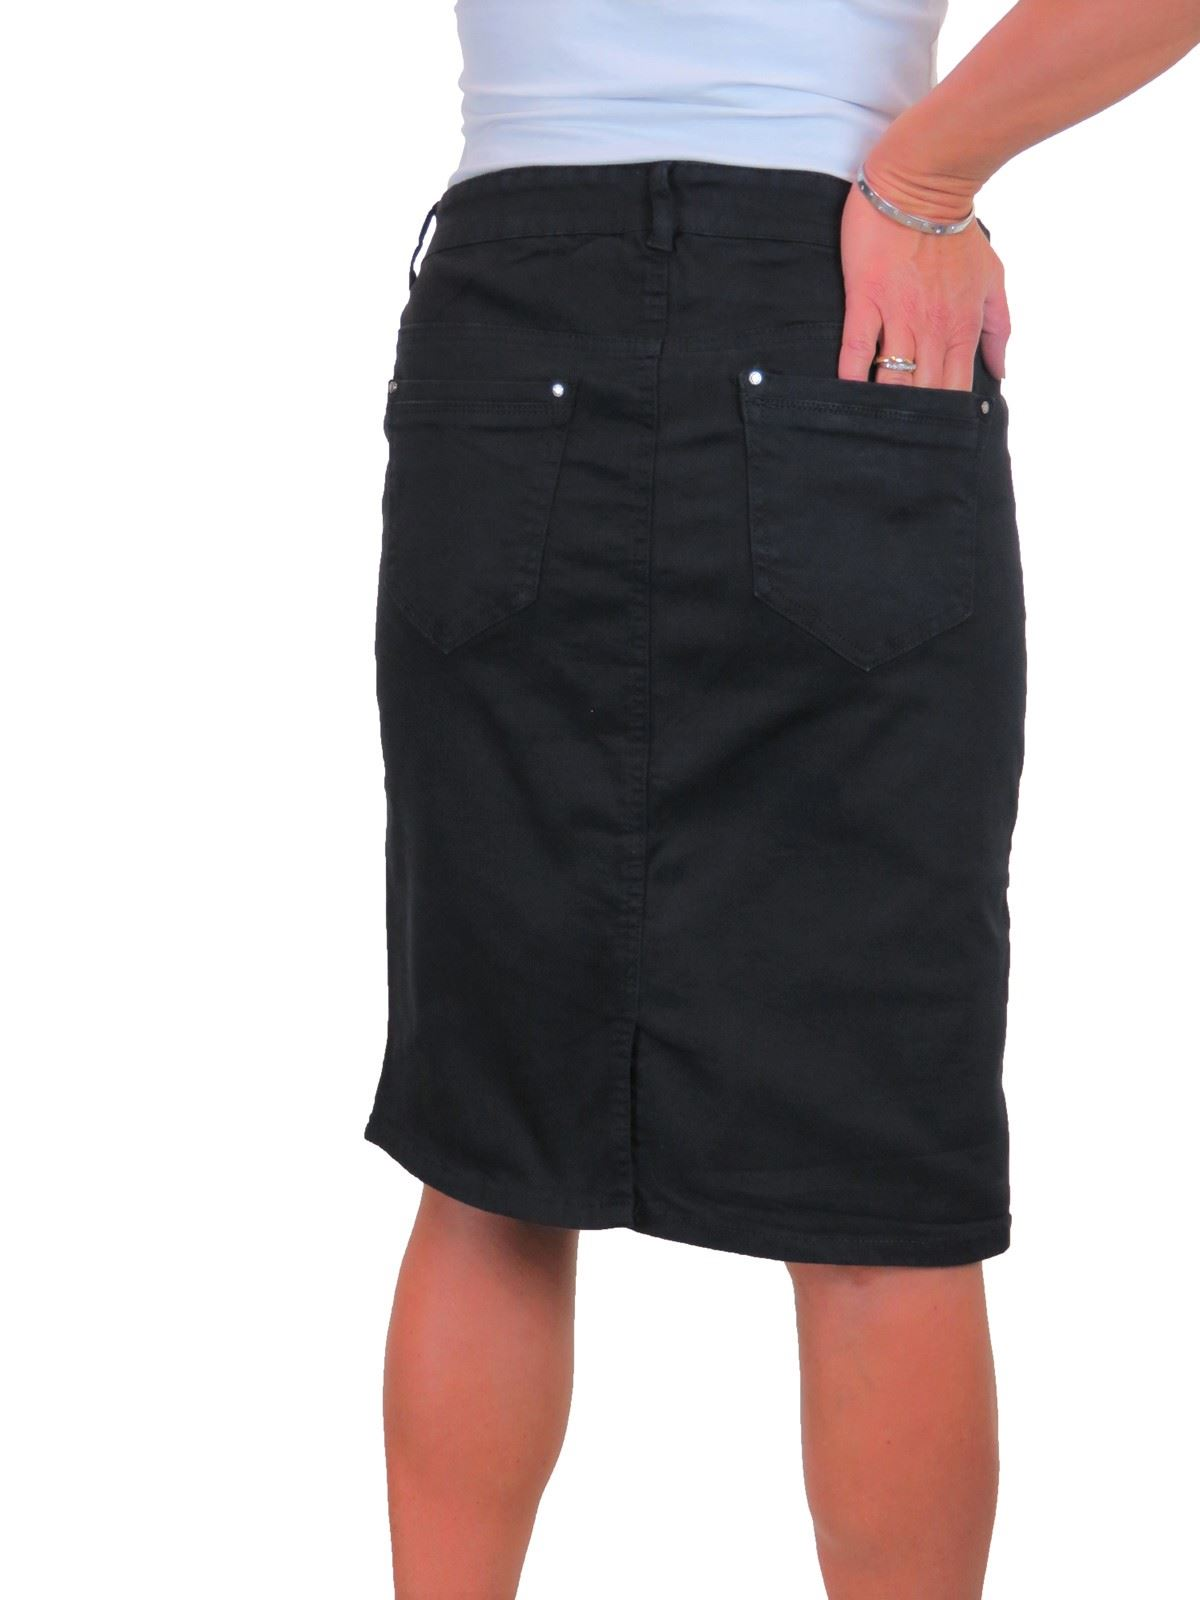 ICE-Womens-Good-Stretch-Jeans-Skirt-Knee-Length-14-22 thumbnail 4